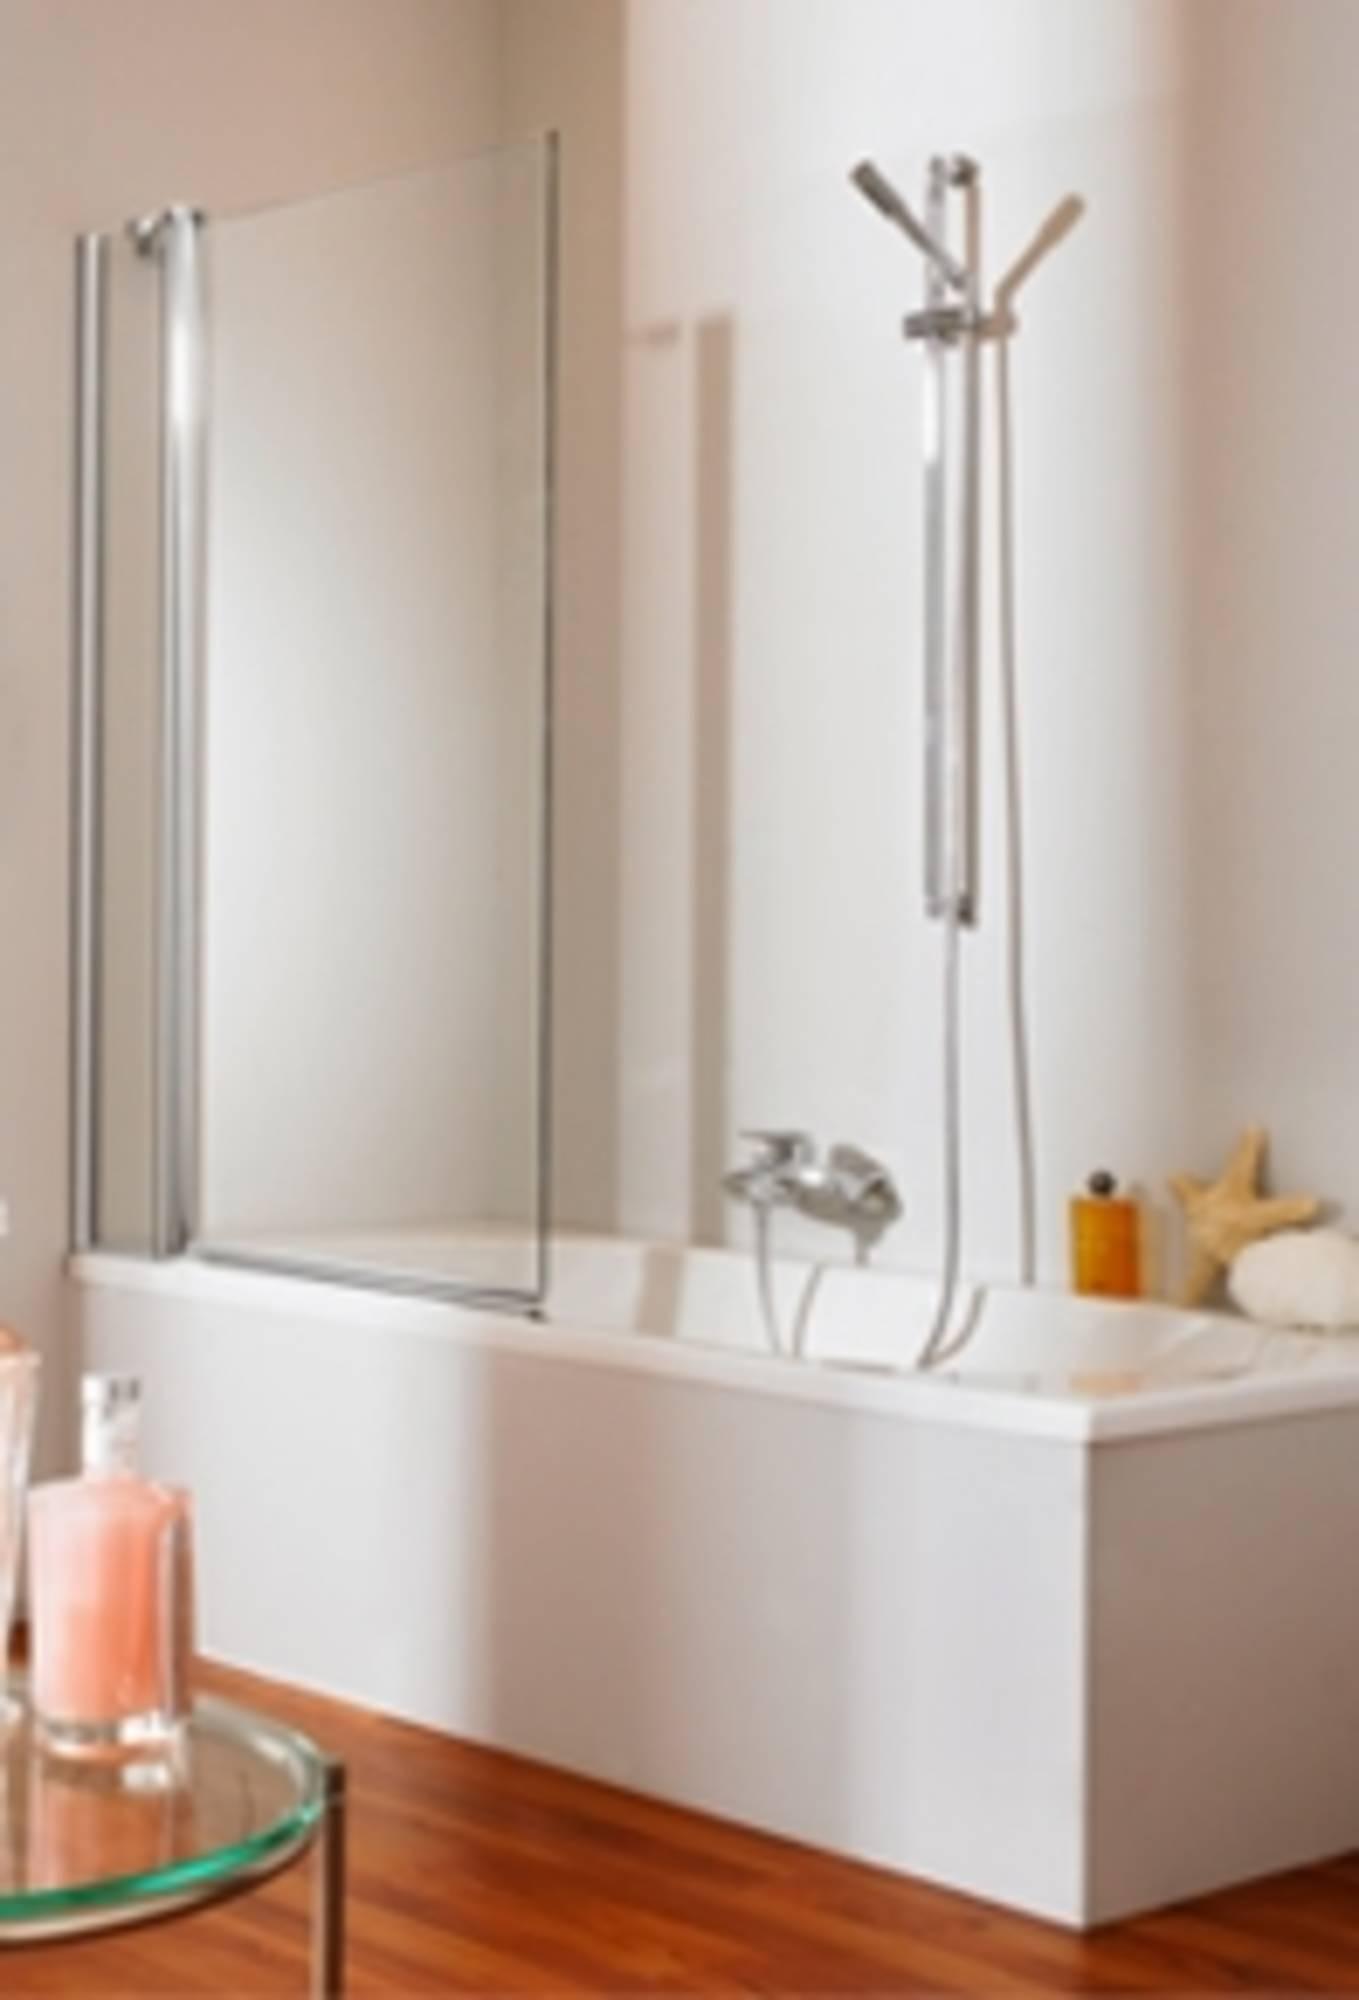 Huppe 501 Design 2-dlgbadklapwand 95x150 cm l+r toepasbaar Matzilver-Helder Glas